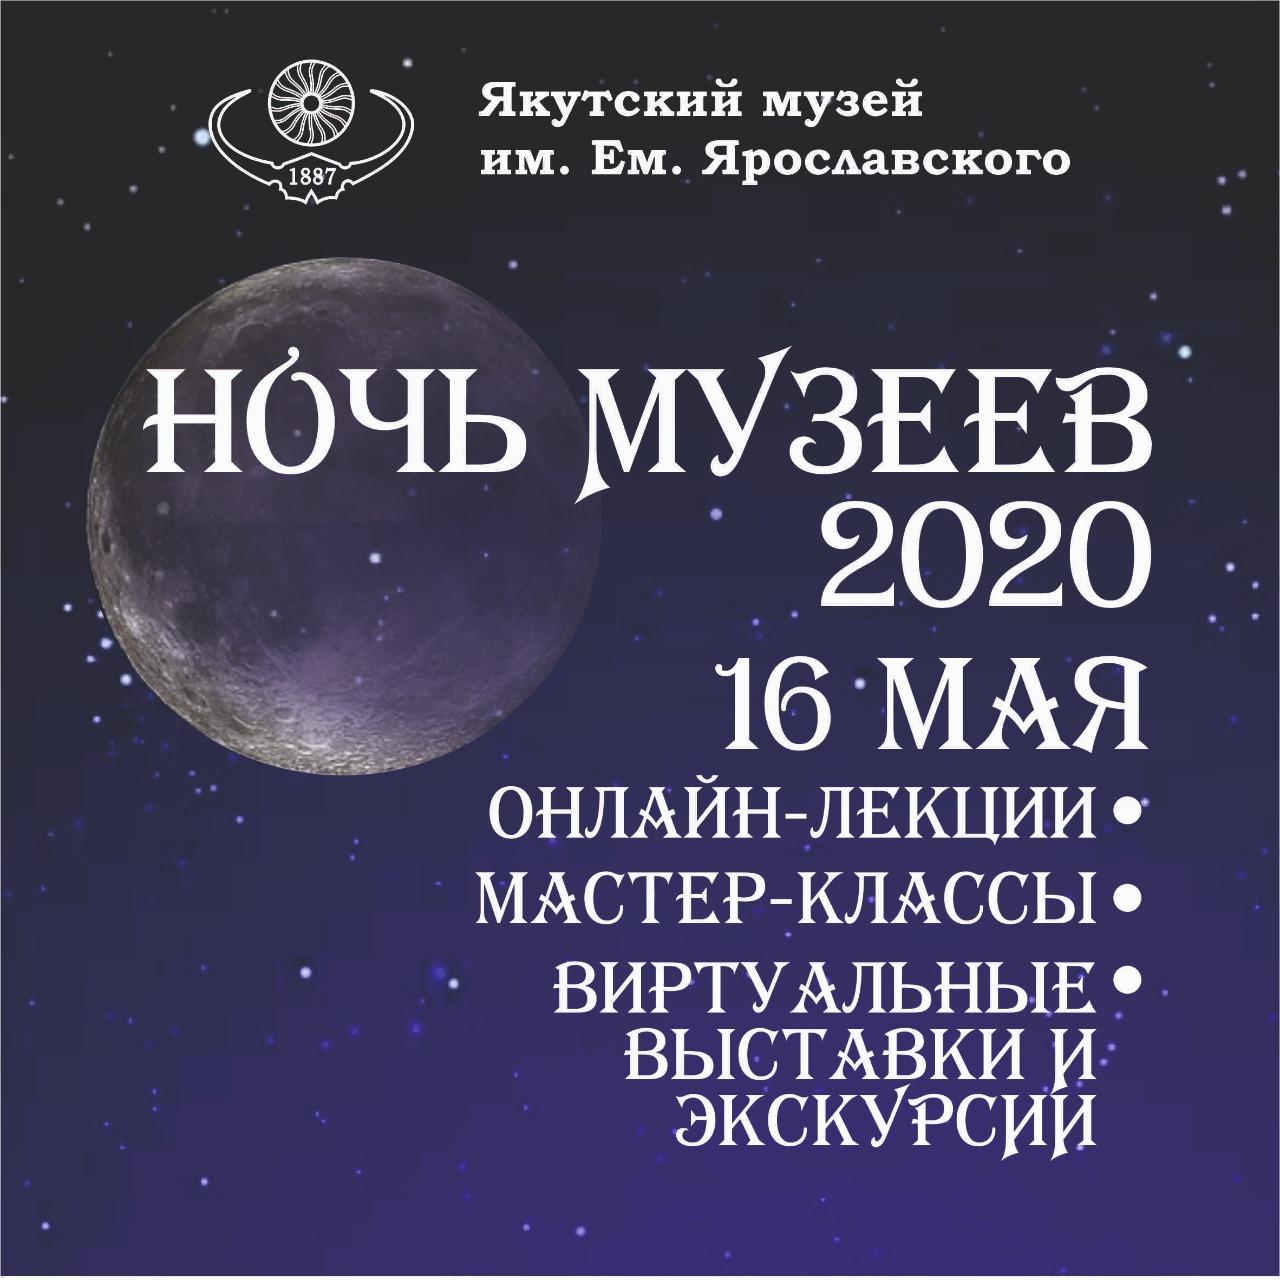 ПРОГРАММА НОЧЬ МУЗЕЕВ -2020 ЯКУТСКОГО МУЗЕЯ ИМ. ЕМ. ЯРОСЛАВСКОГО